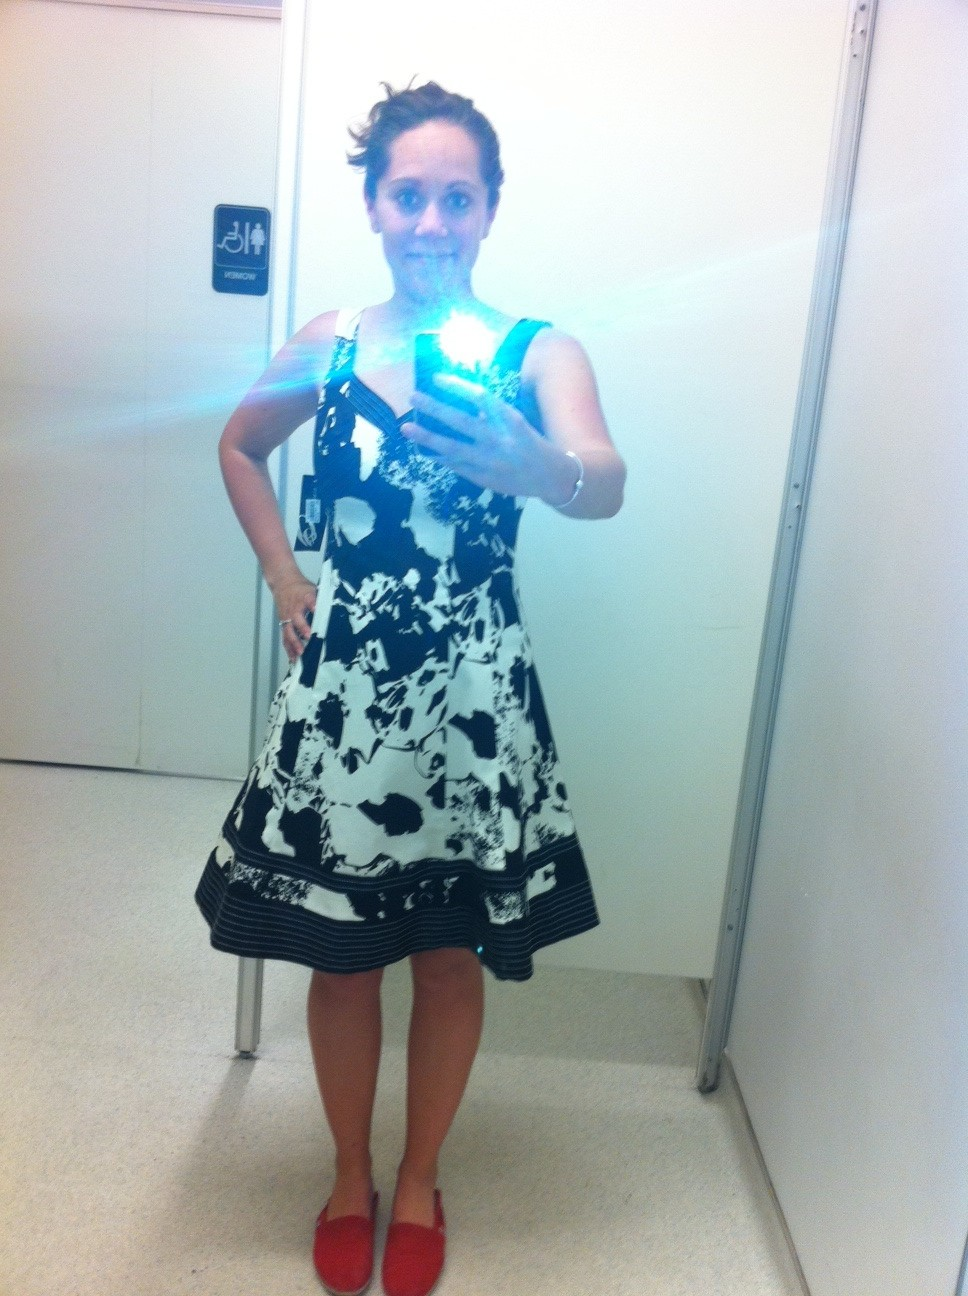 Prom Dress Shopping! | That Runner Chick